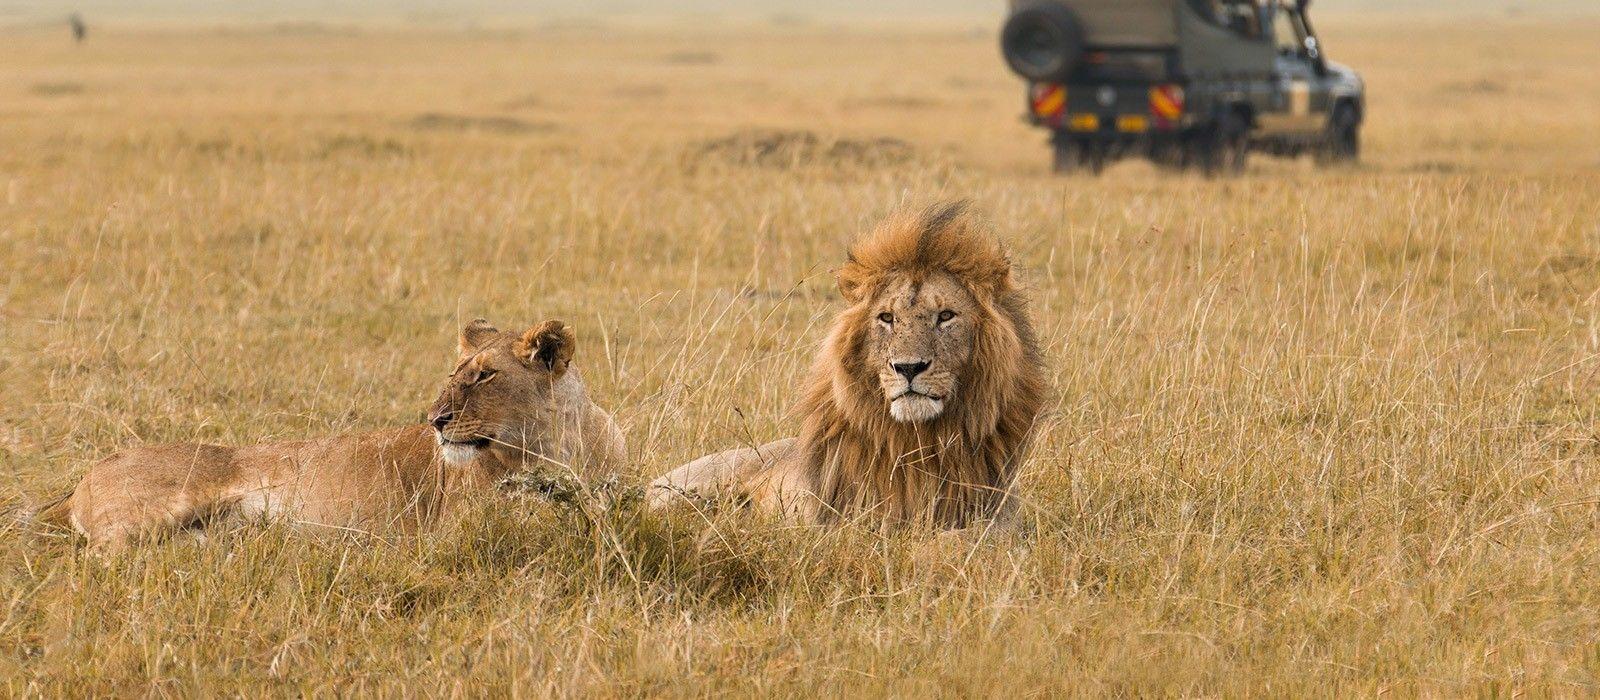 Safari Highlights of Kenya Tour Trip 4